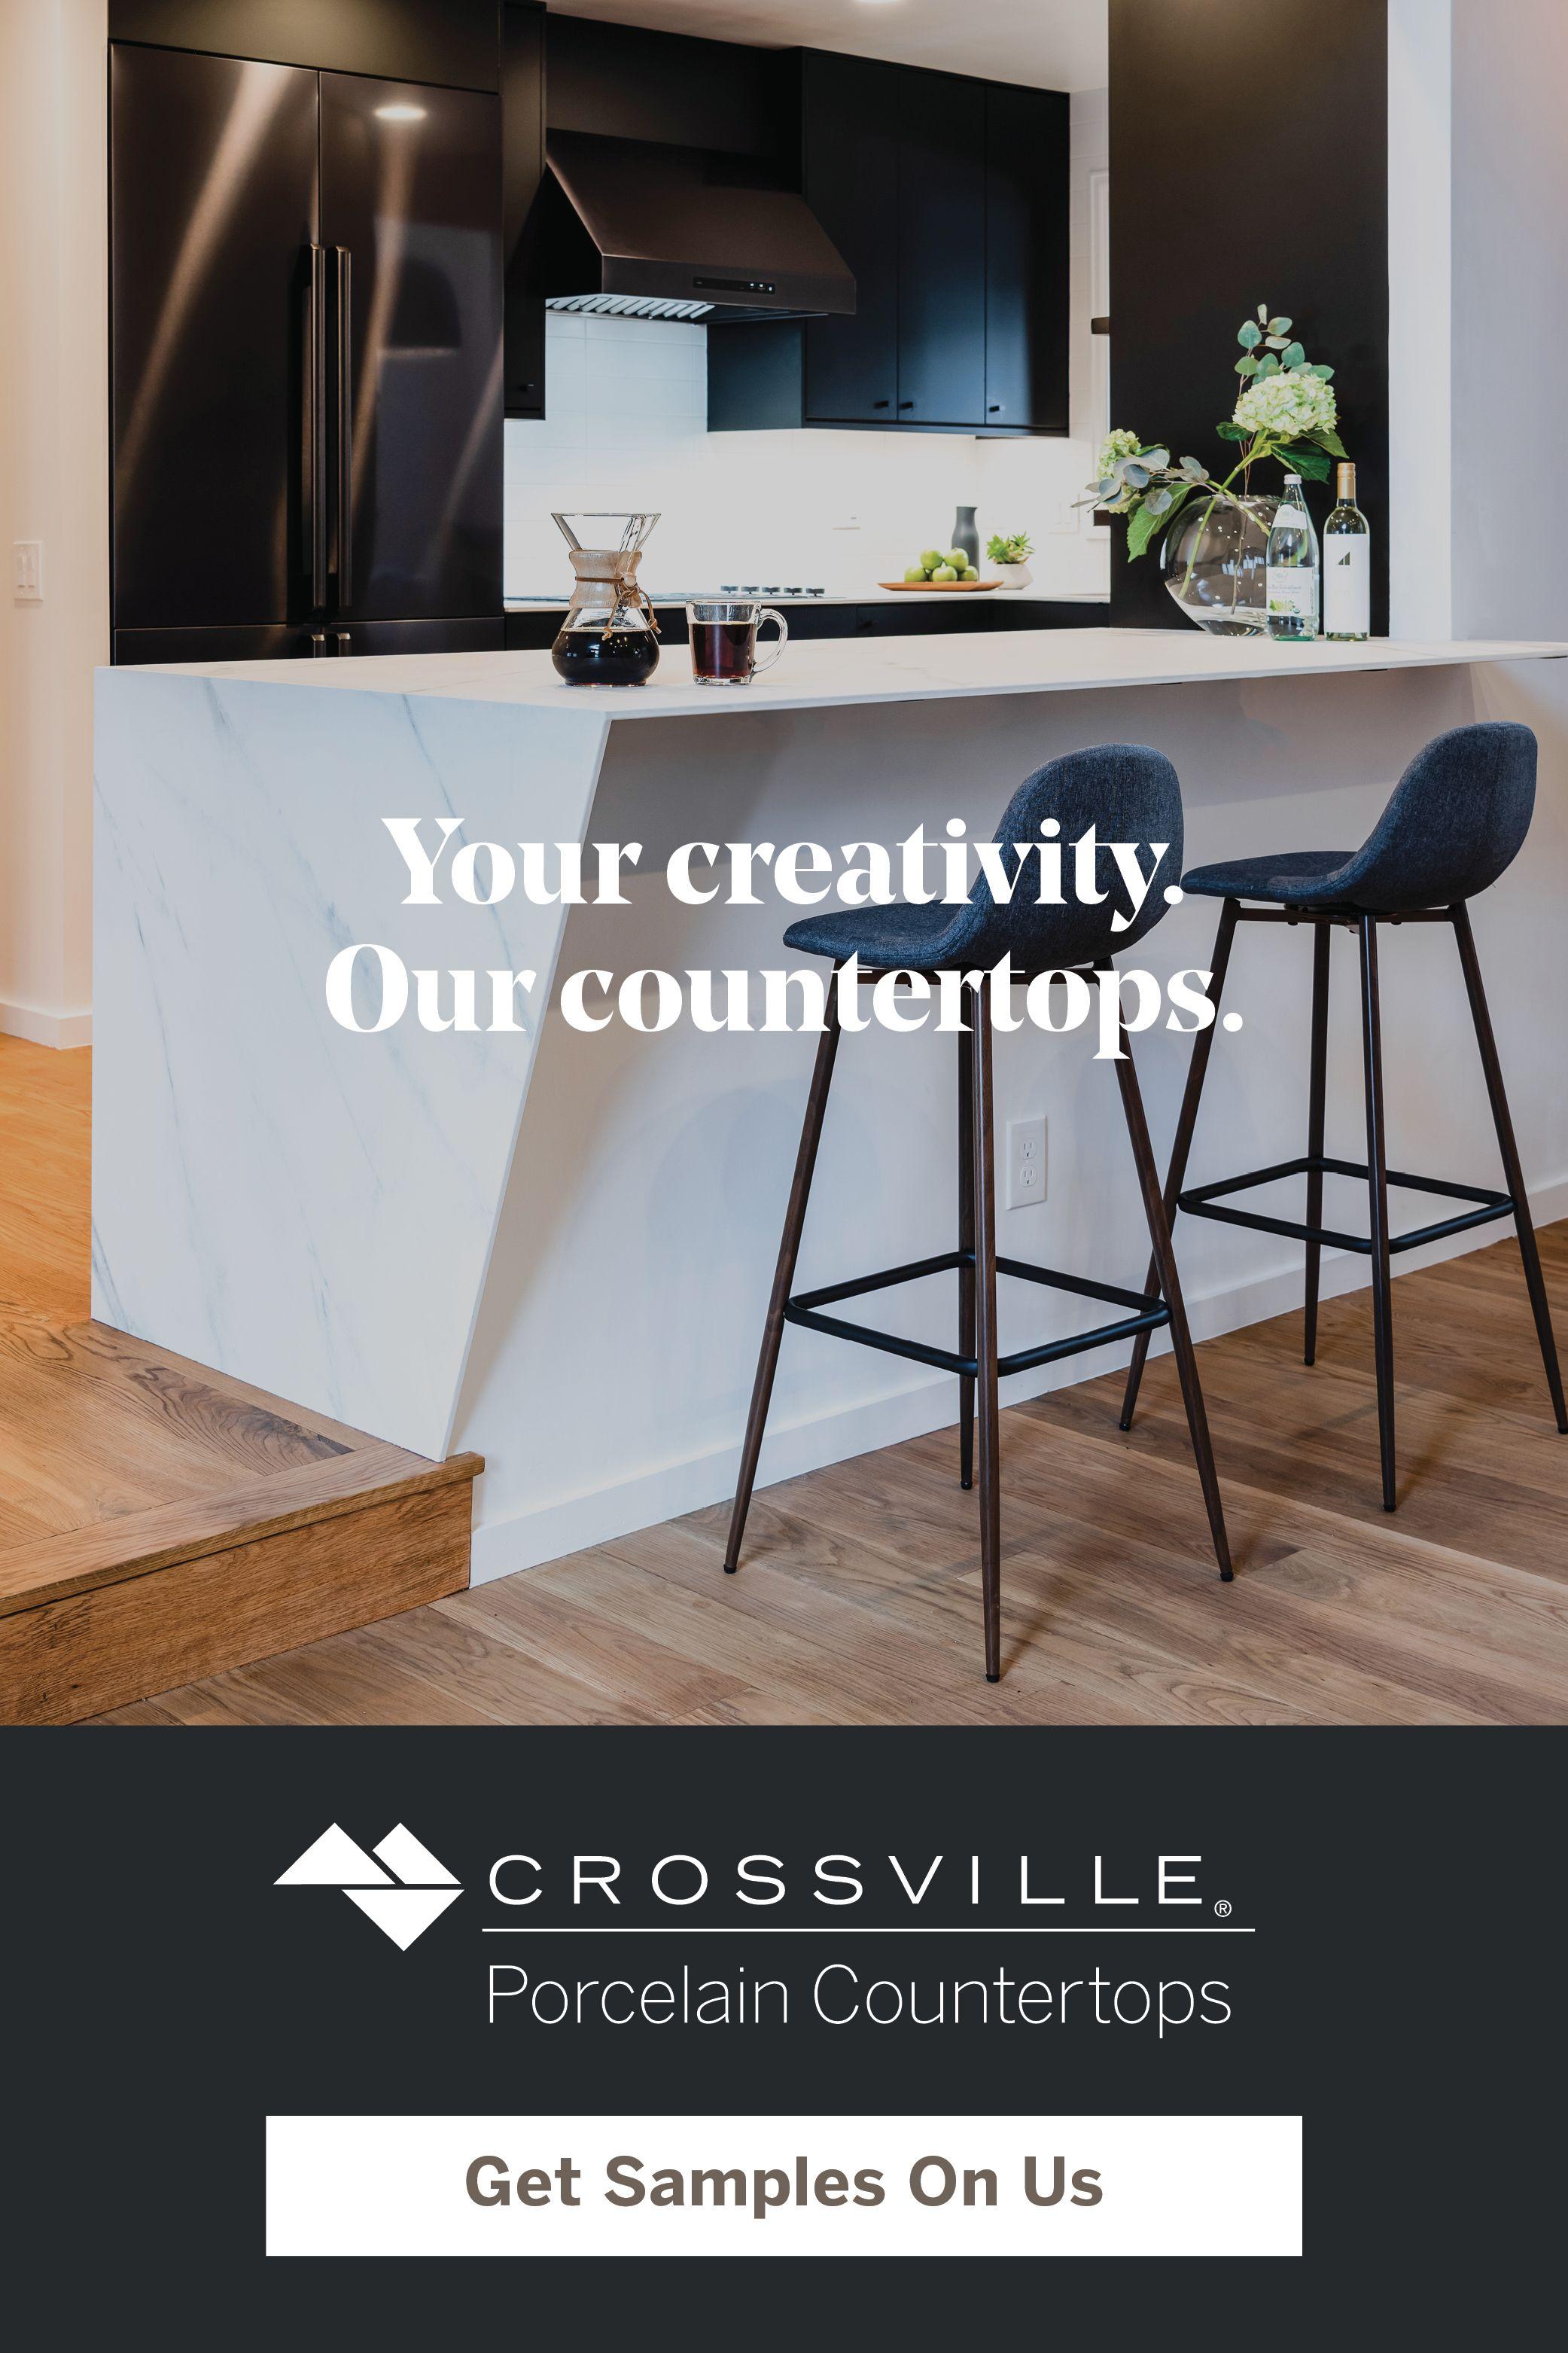 Pin On Crossville Studios Countertops By Crossville Inc